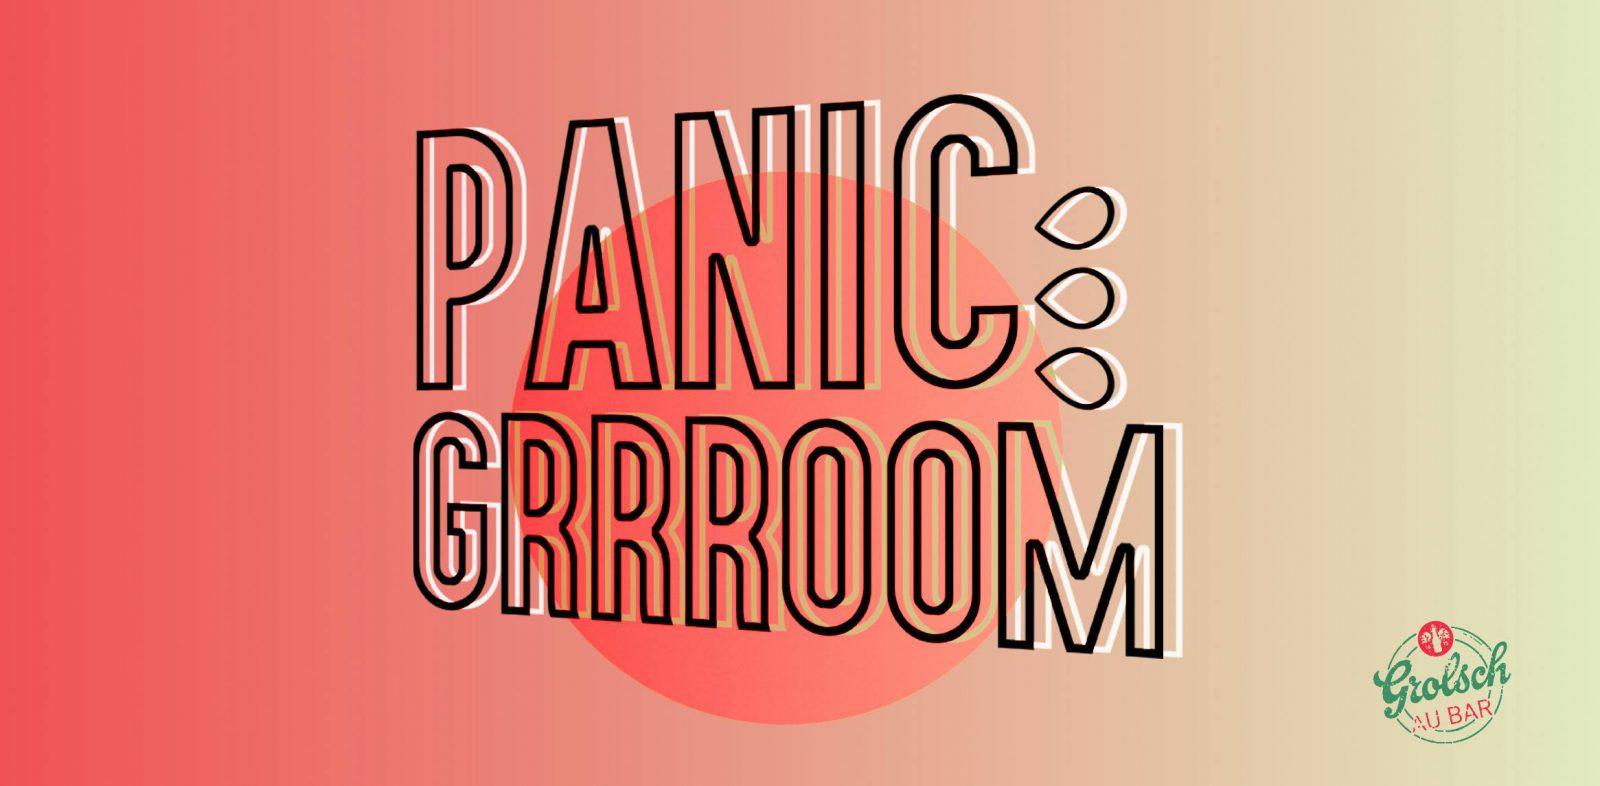 [Soirée] Panic Grrroom w/PWFM, Badass & Kiblind